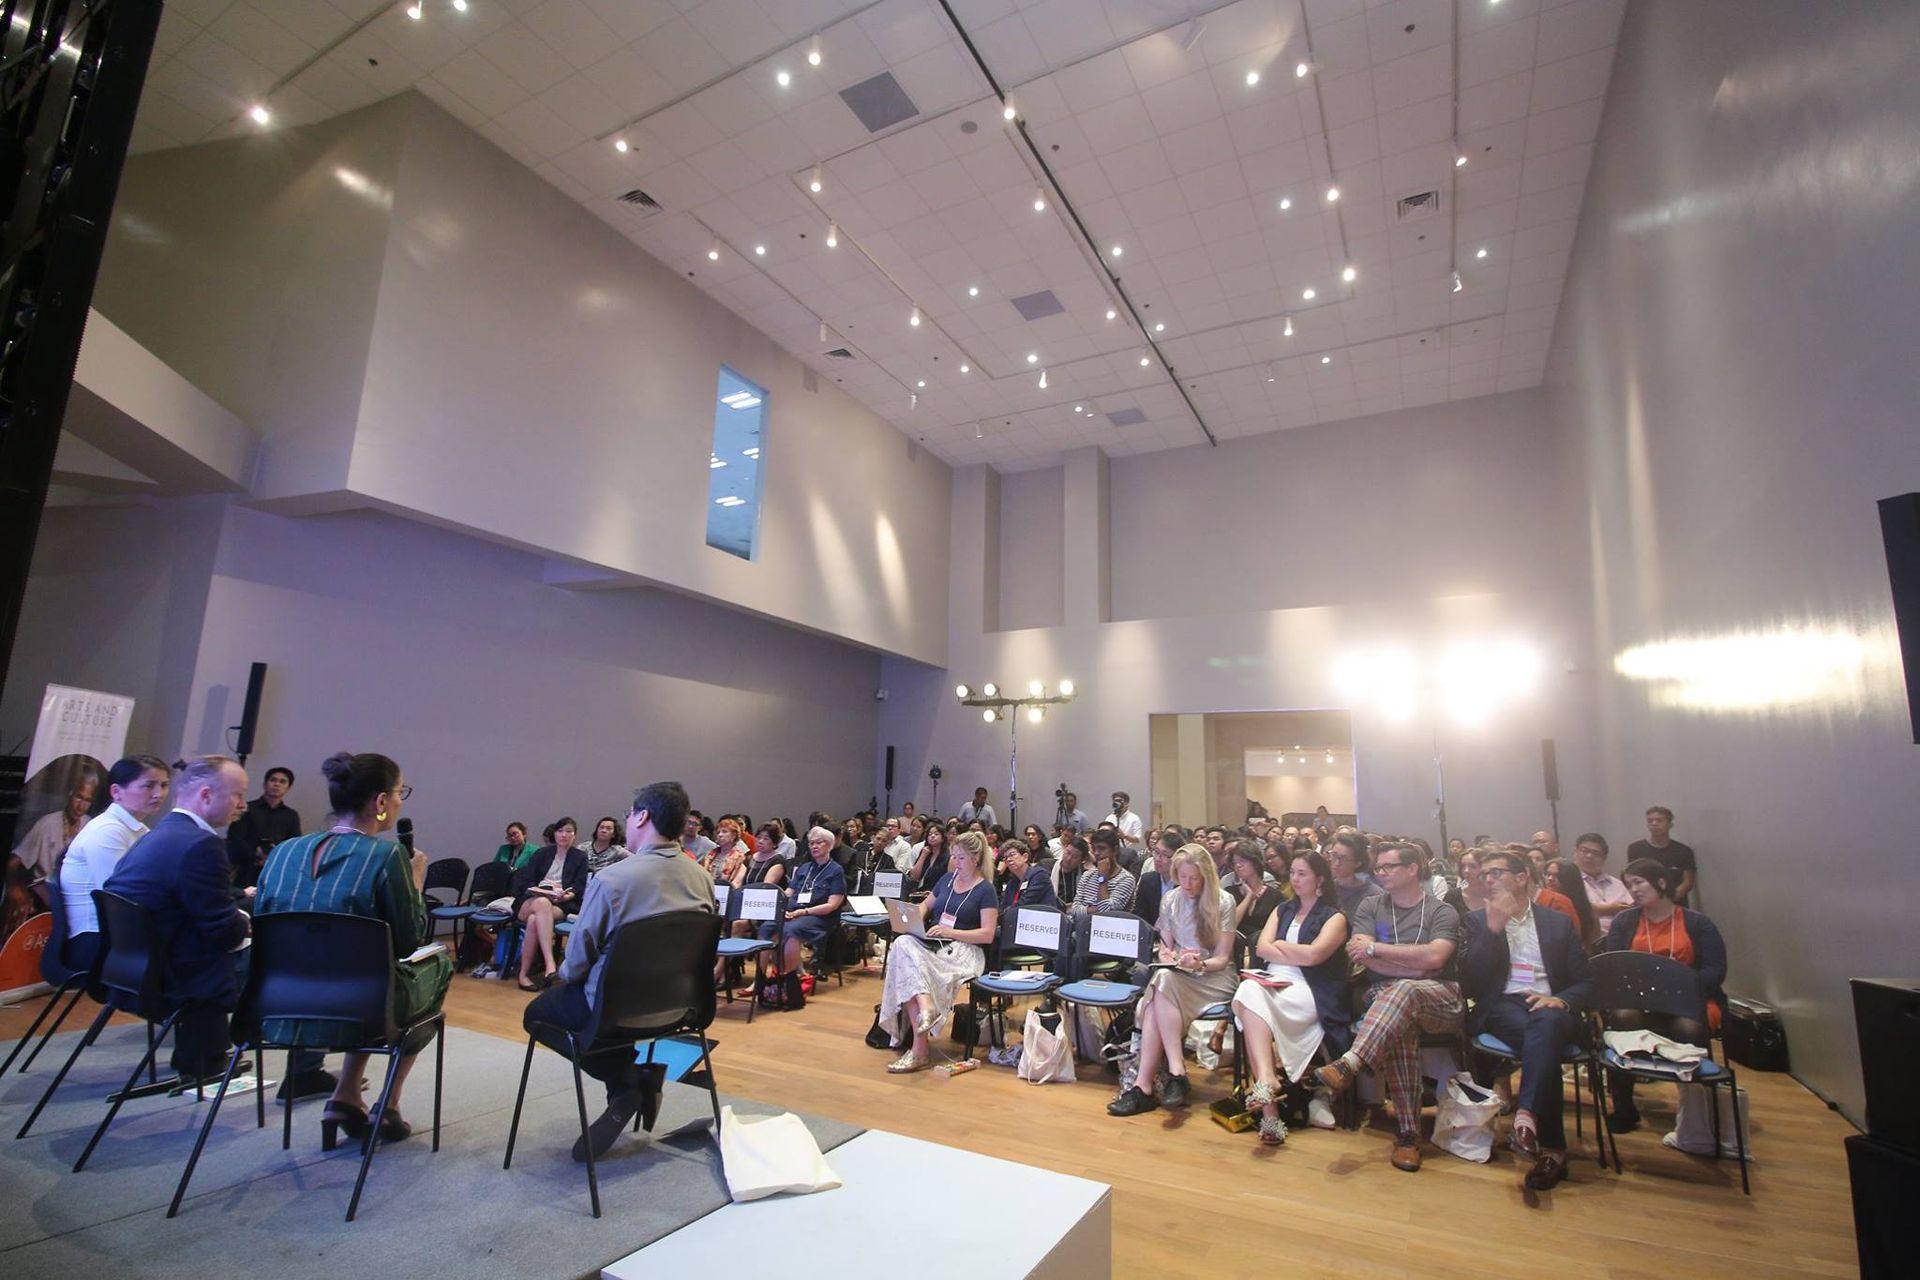 Asia Society 2017 Arts & Museum Summit